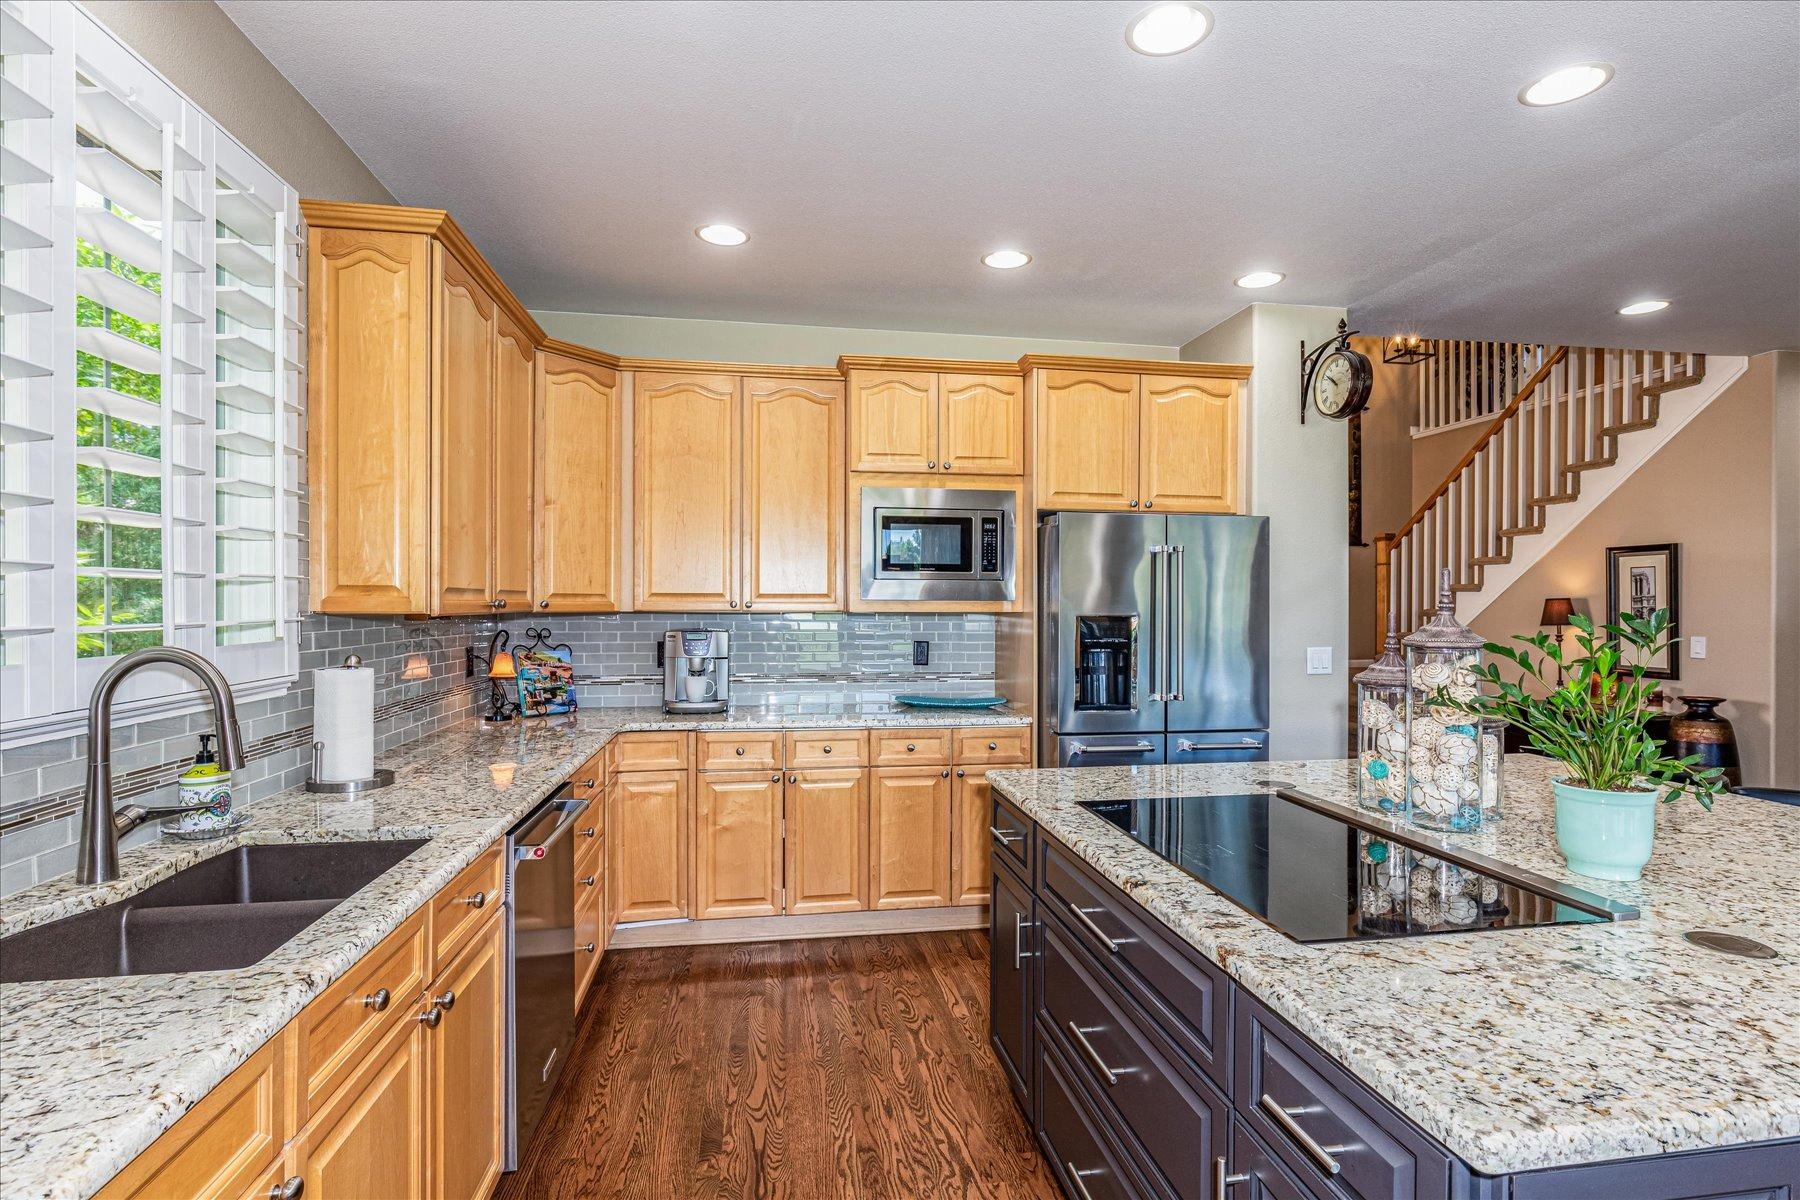 Abundant Maple Cabinetry with Slab Granite